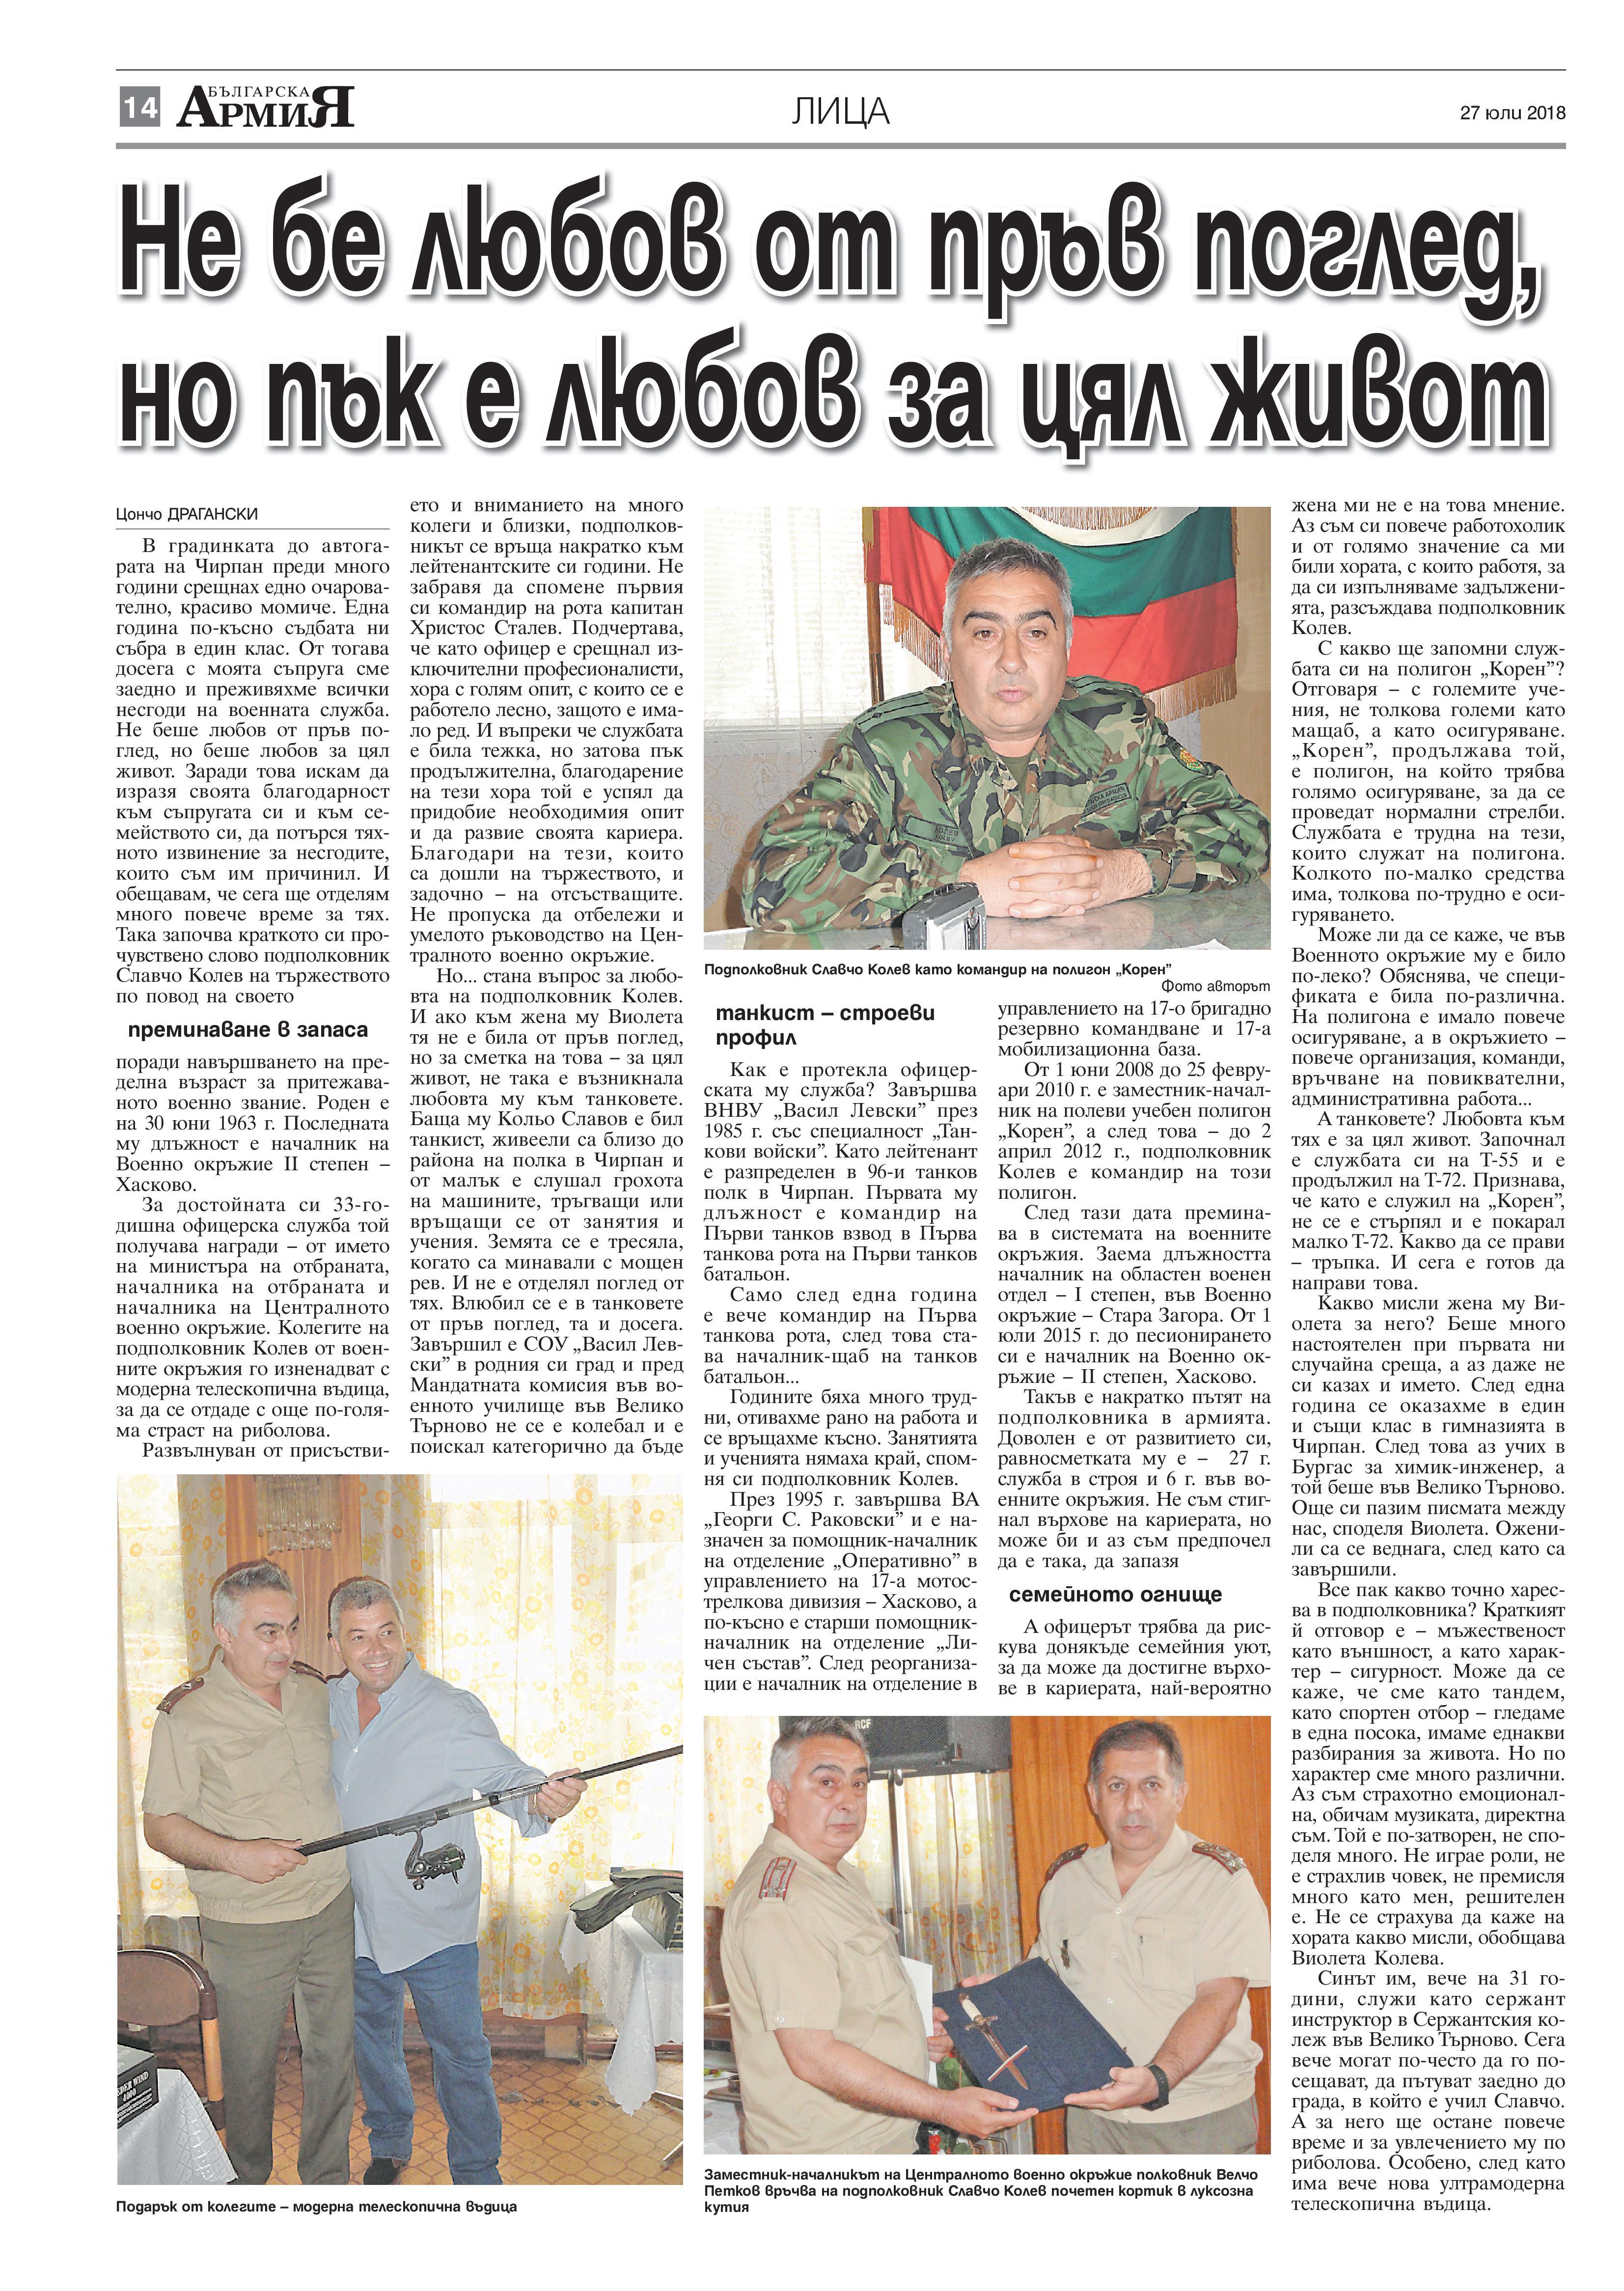 https://armymedia.bg/wp-content/uploads/2015/06/14-23.jpg